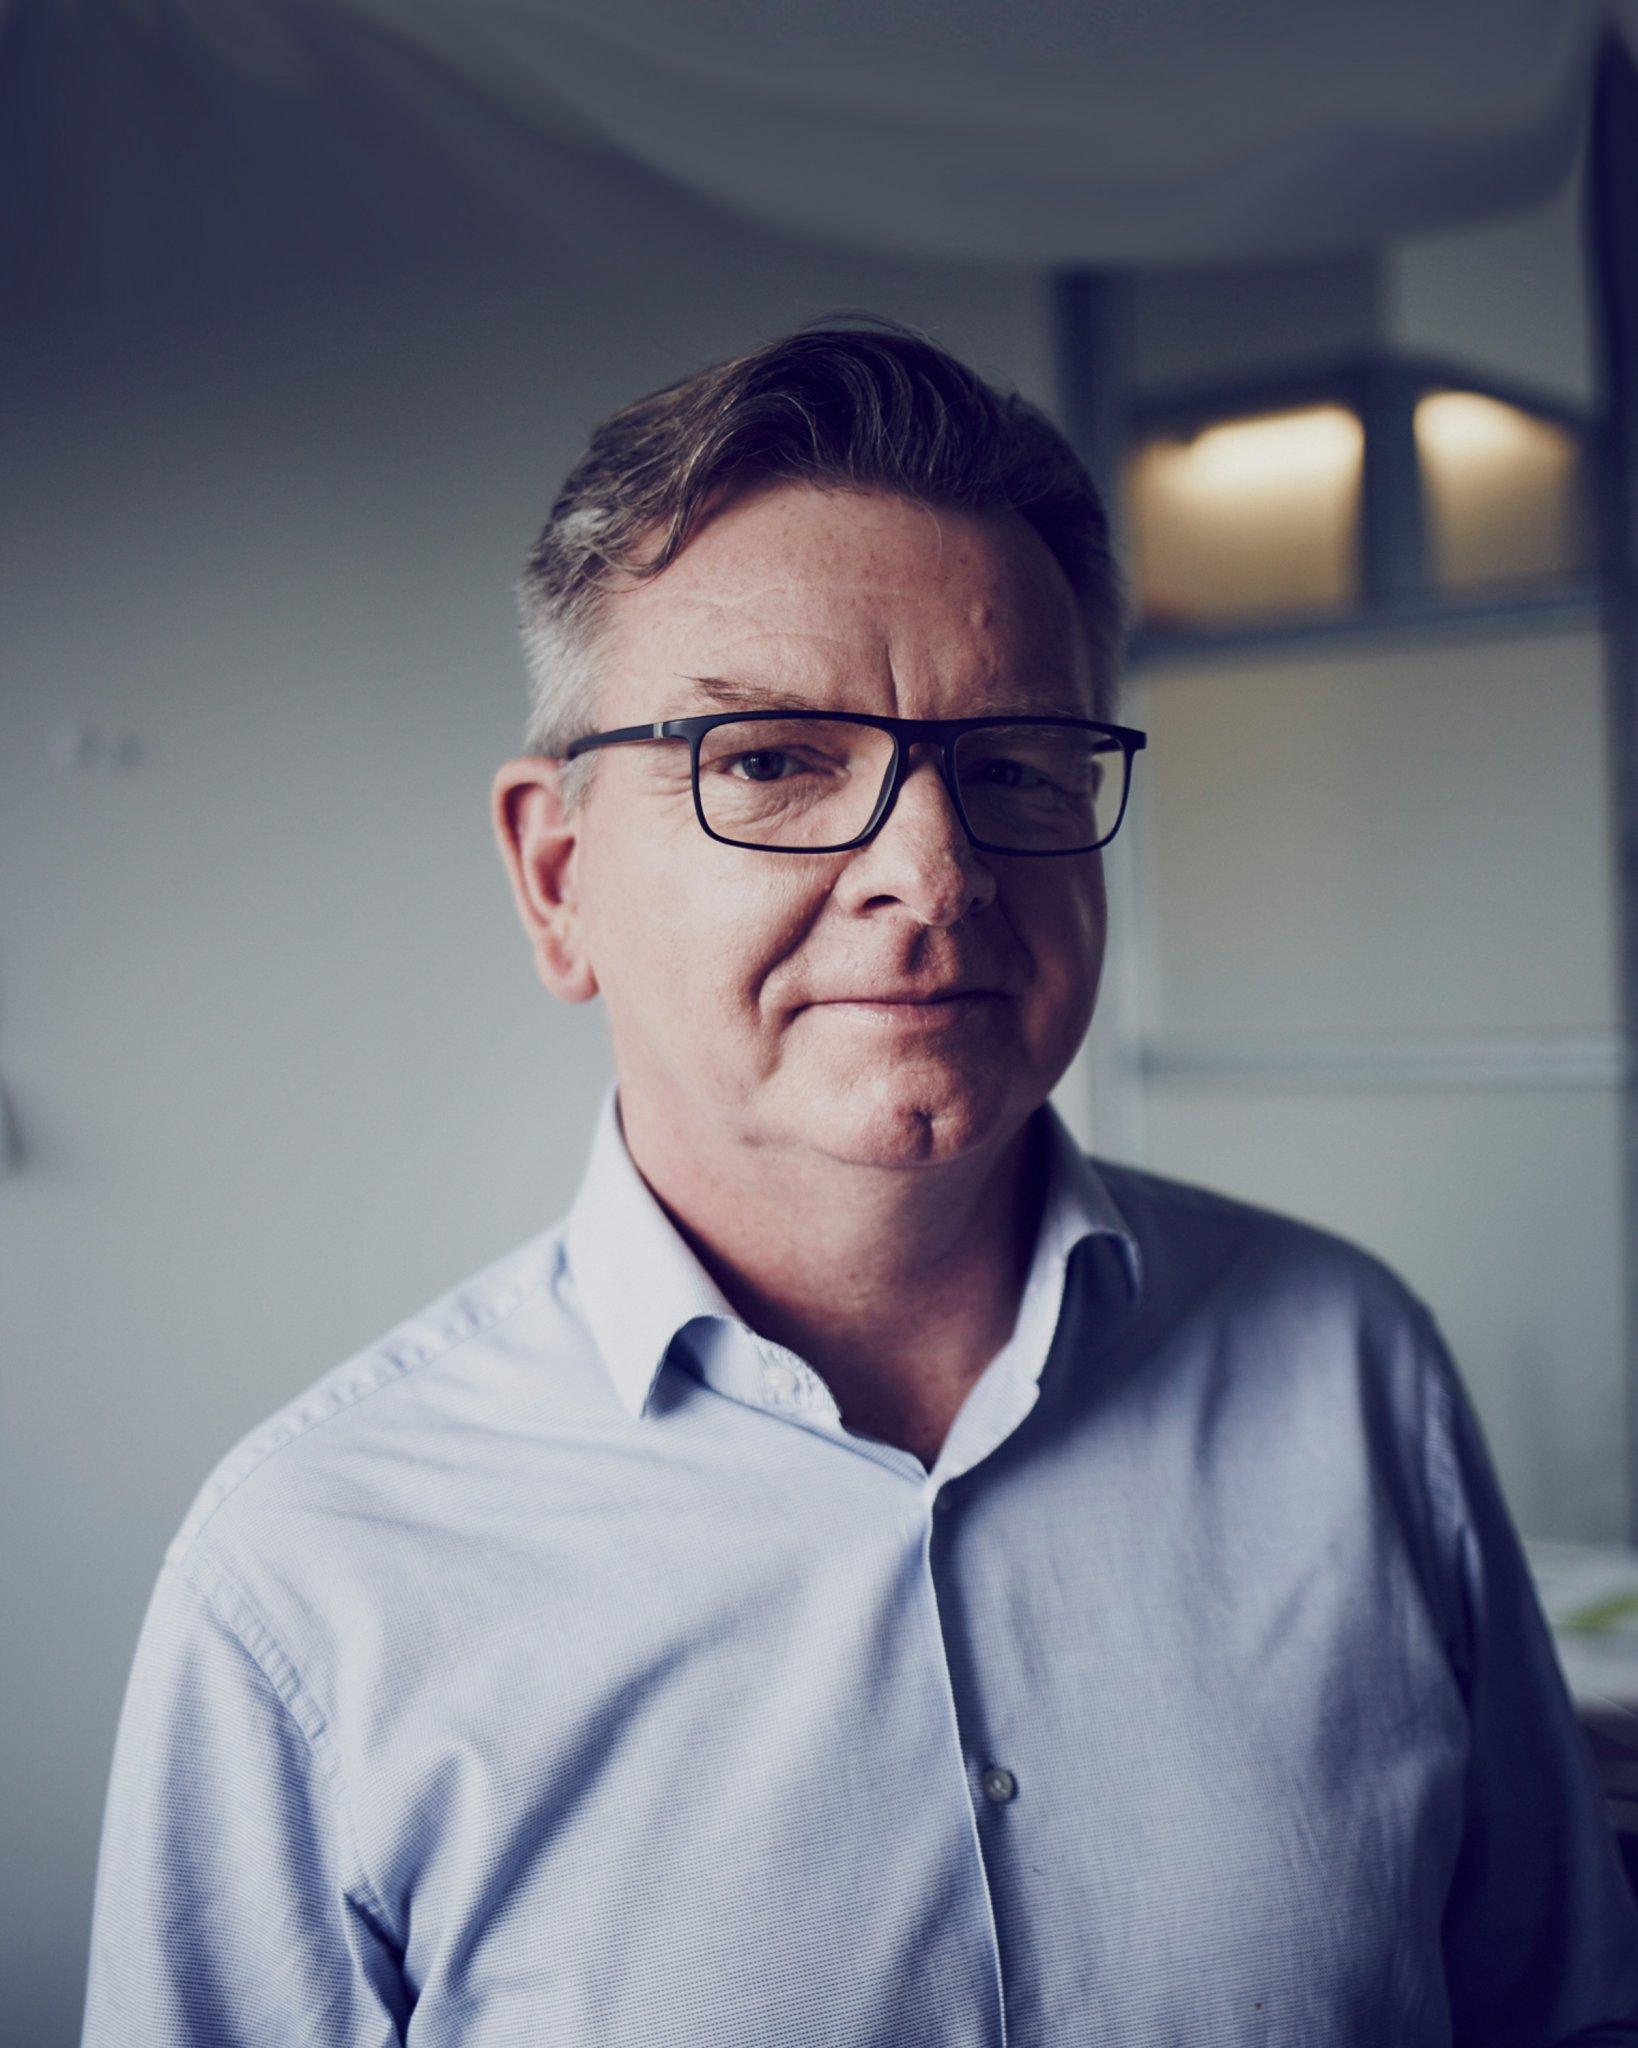 Hans-Joachim Graef, Konsequent PR-Agentur Osnabrück